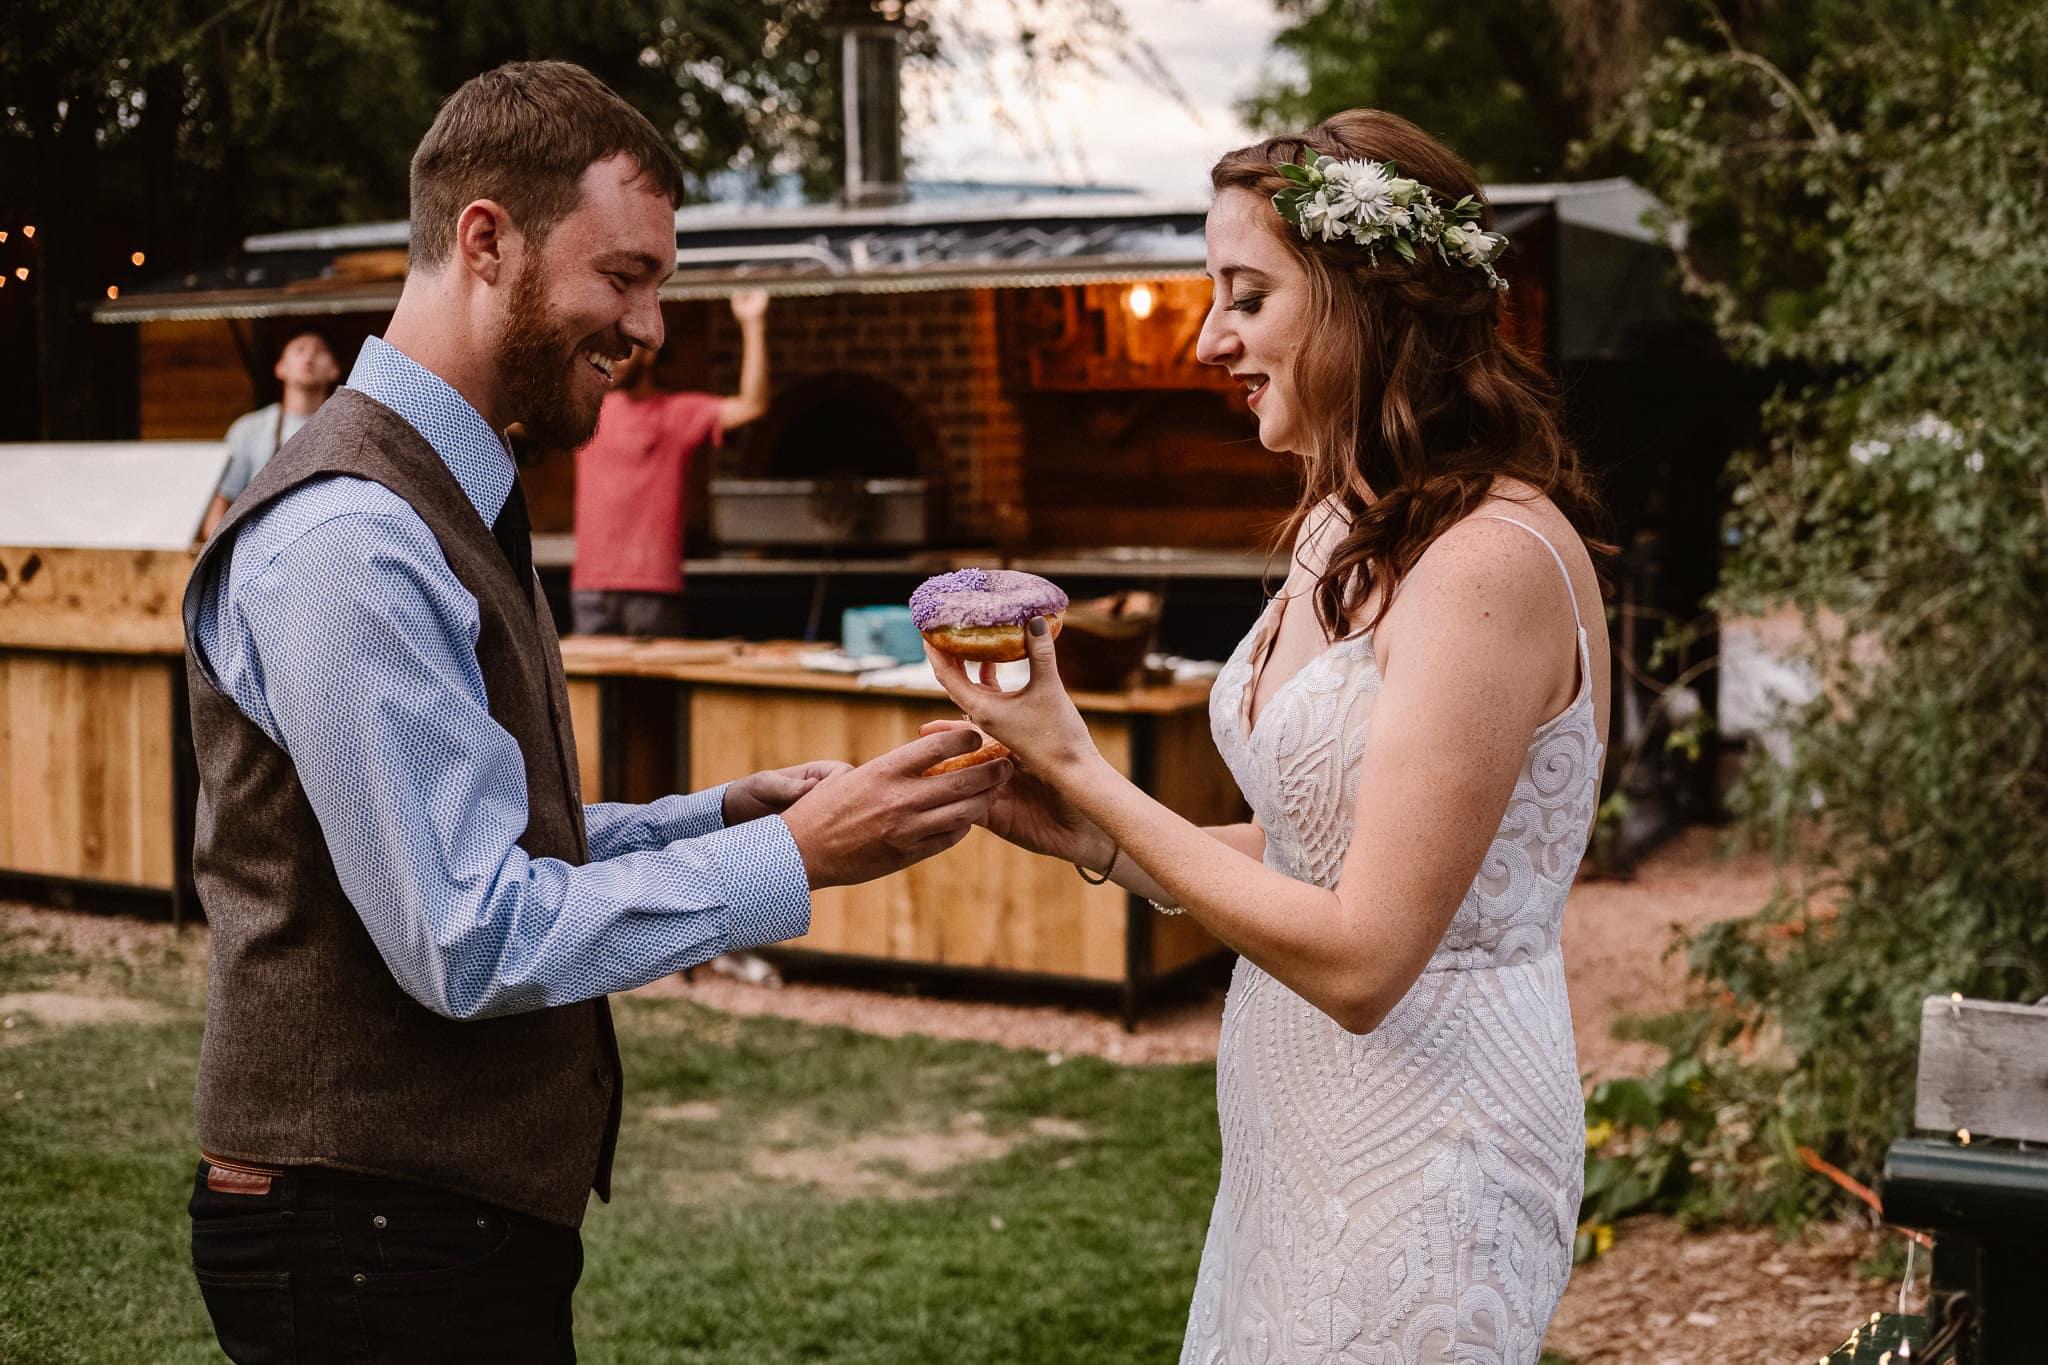 Lyons Farmette wedding photographer, Colorado intimate wedding photographer, wedding donuts by Voodoo Doughnut, bride and groom sharing donut